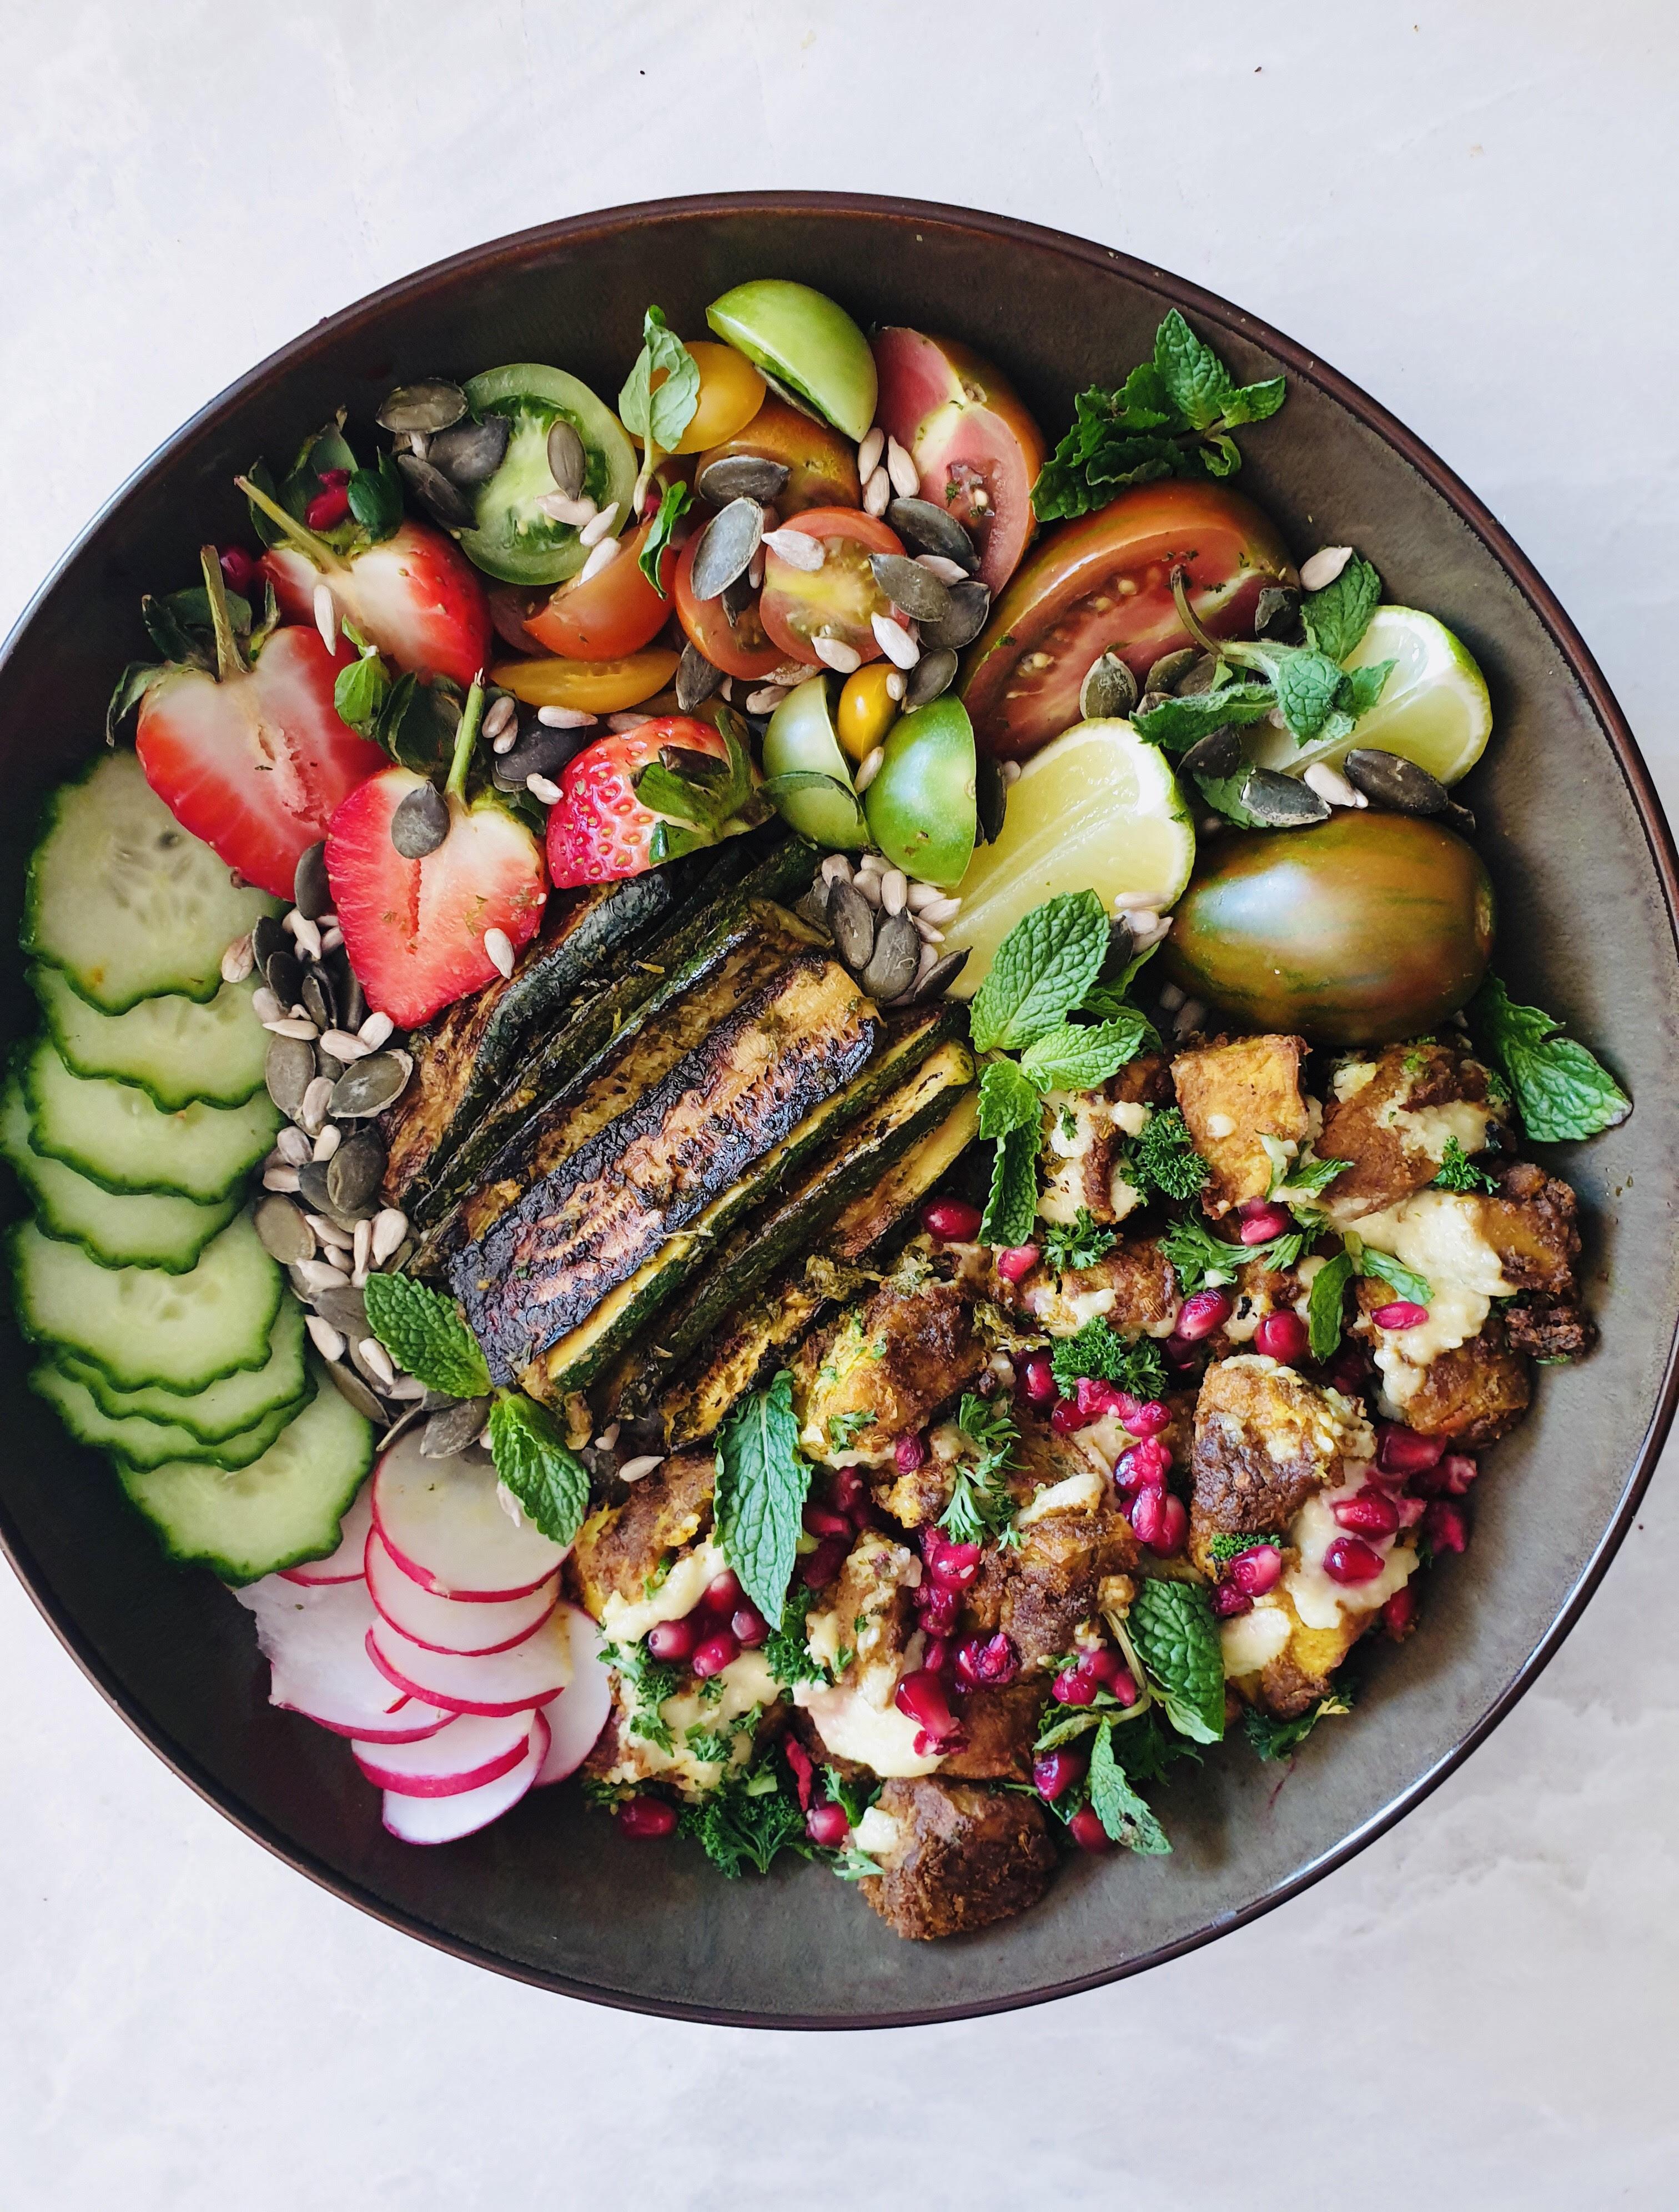 Healthy Zucchini Sweet Potato Nourishing Bowl